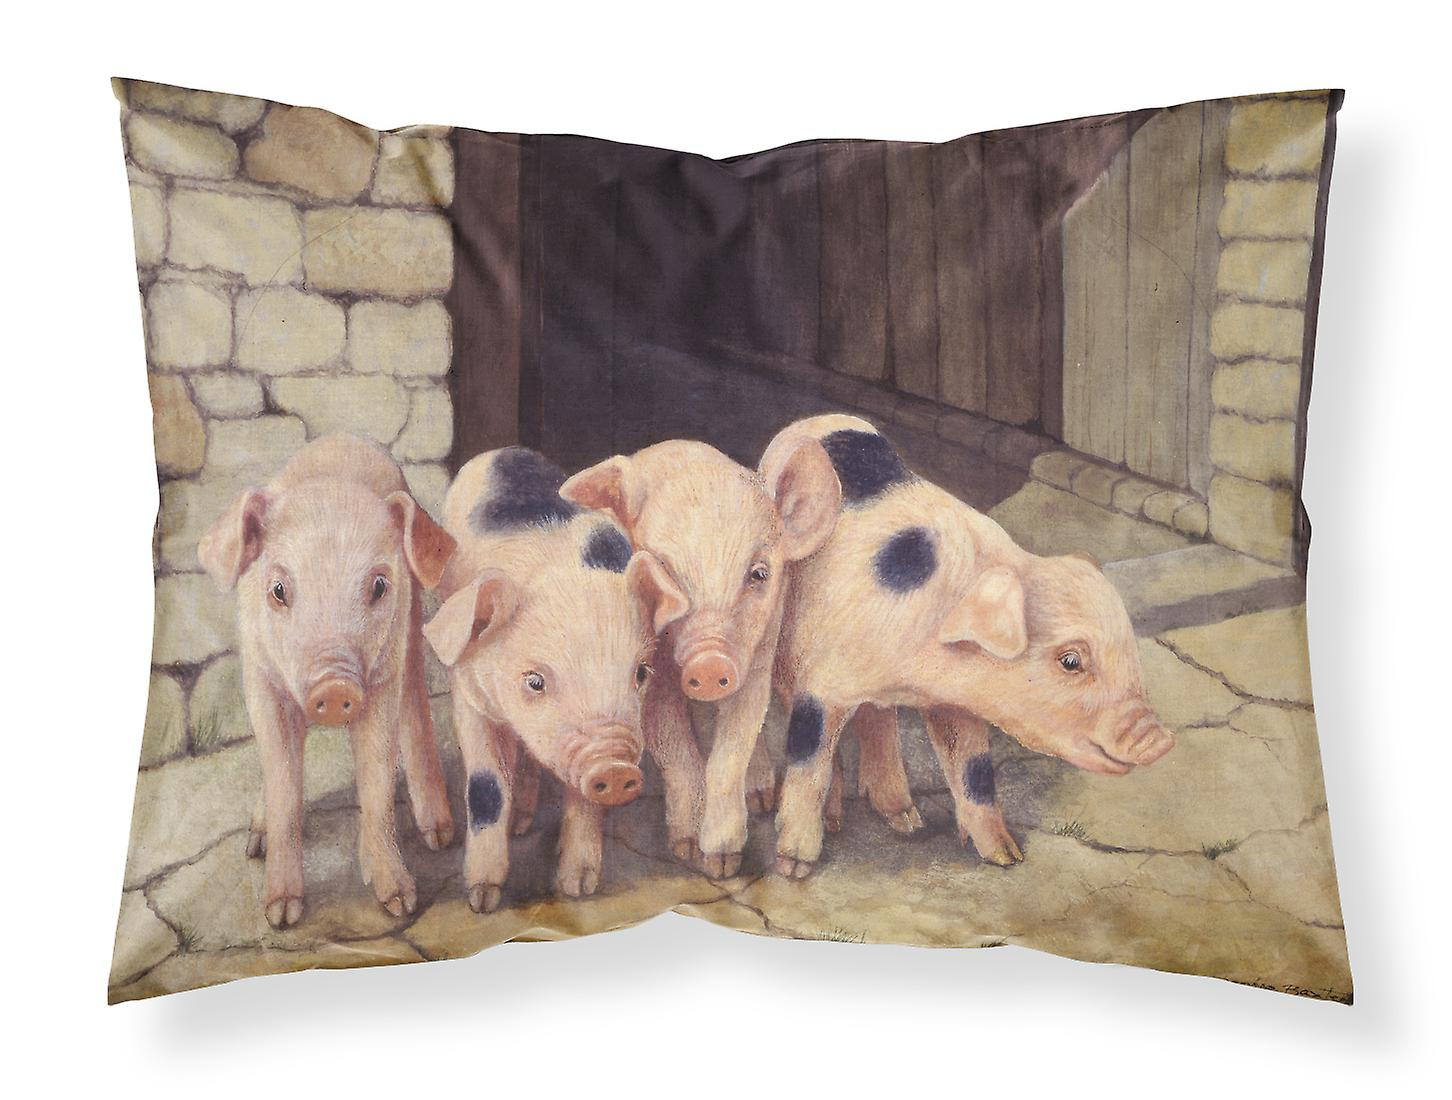 Baxter Taie Tissu Standard D'oreiller De Porcs Par Daphne Porcelets OPkX8w0n